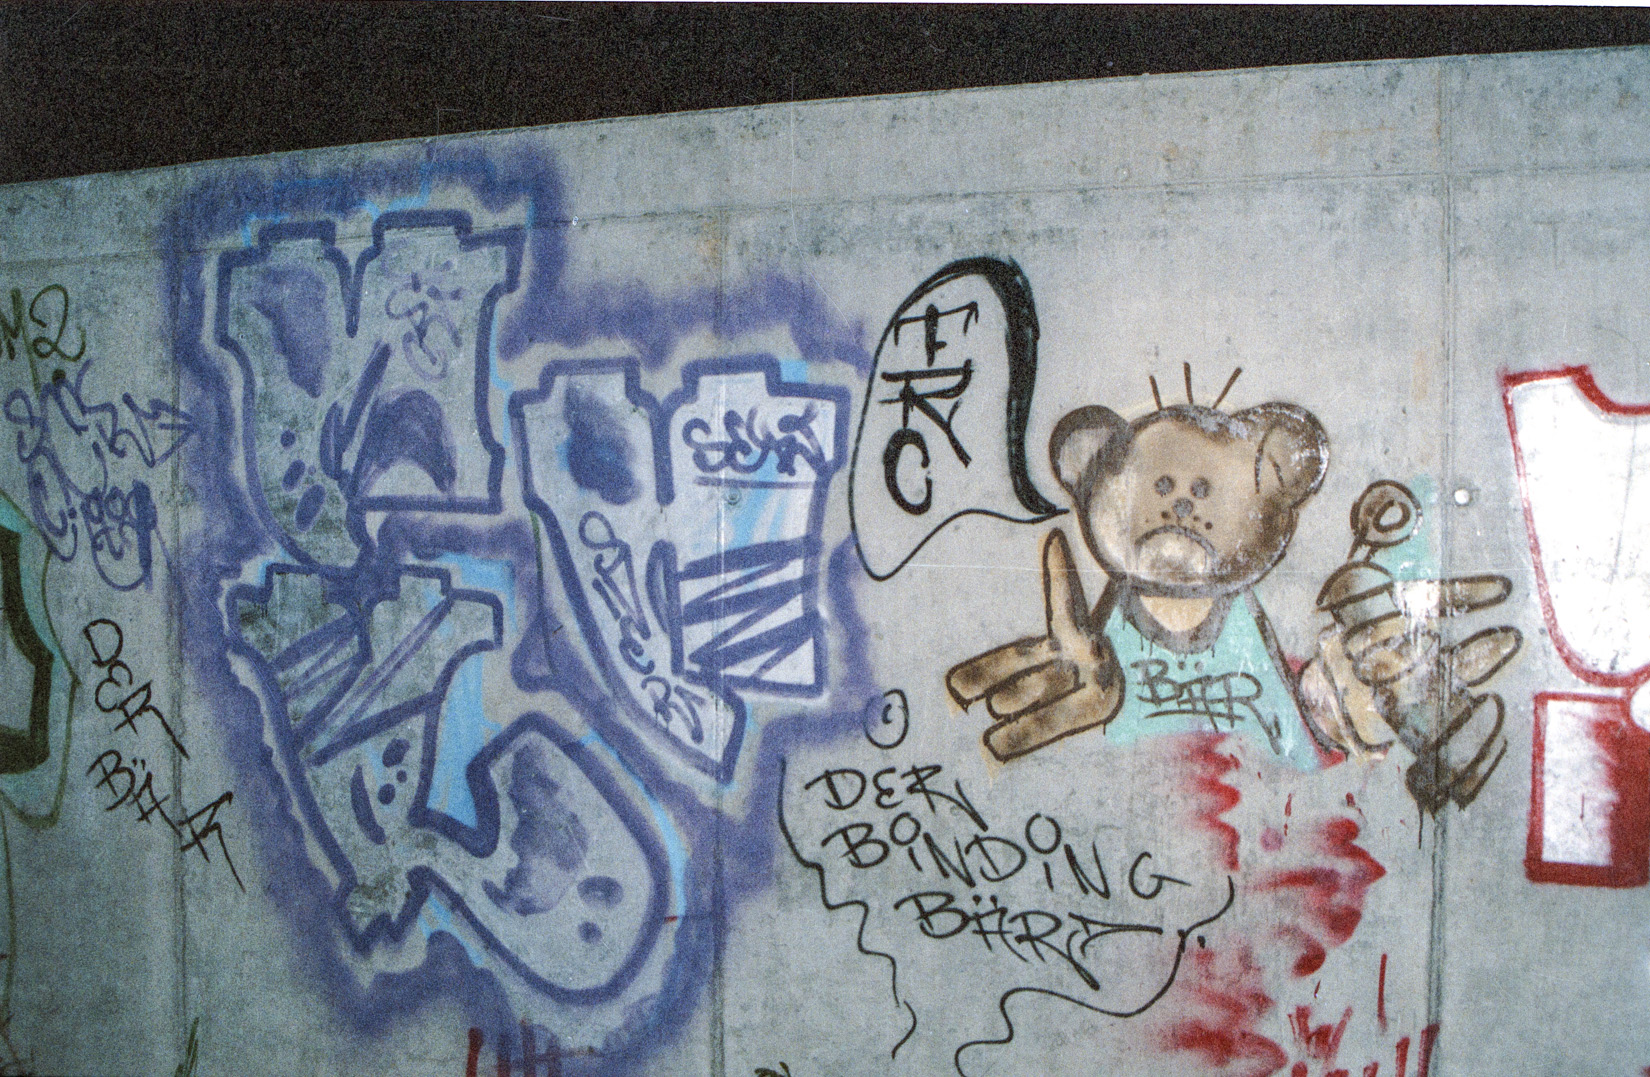 Frankfurt_Graffiti_1988_1989_H88_FRC (22 von 25)